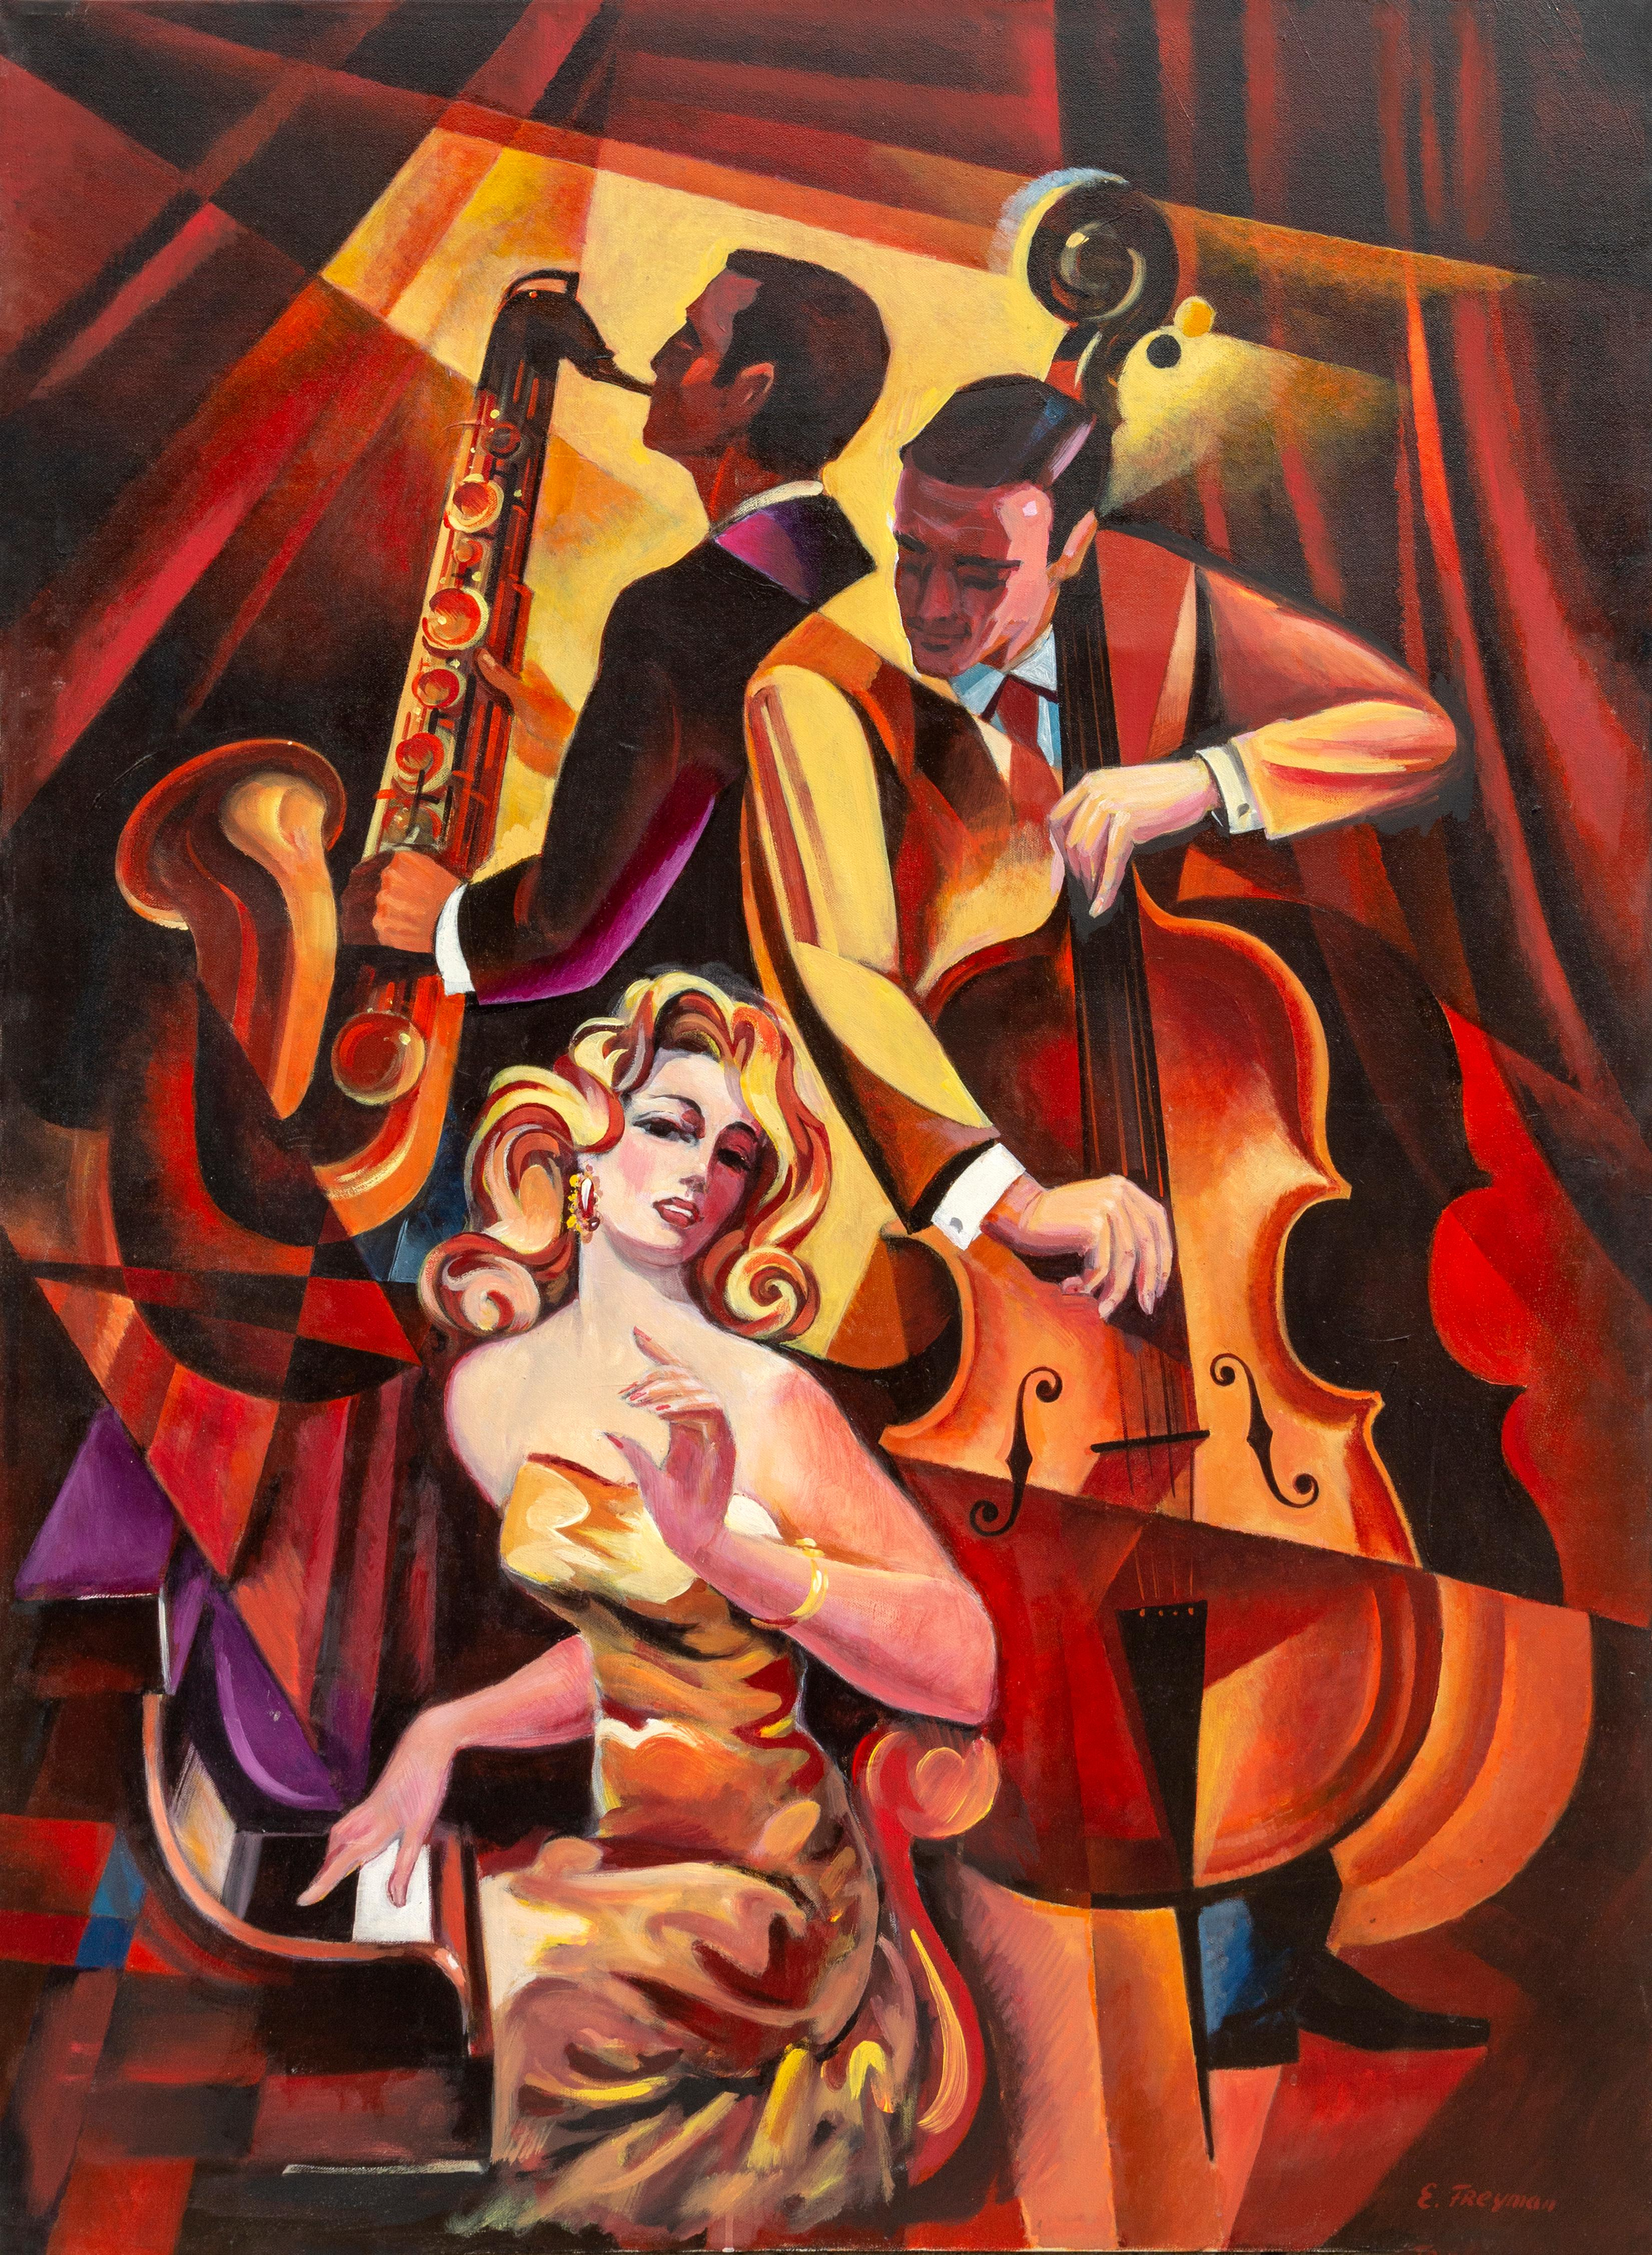 Duet #1, Large Art Deco Painting by Erik Freyman